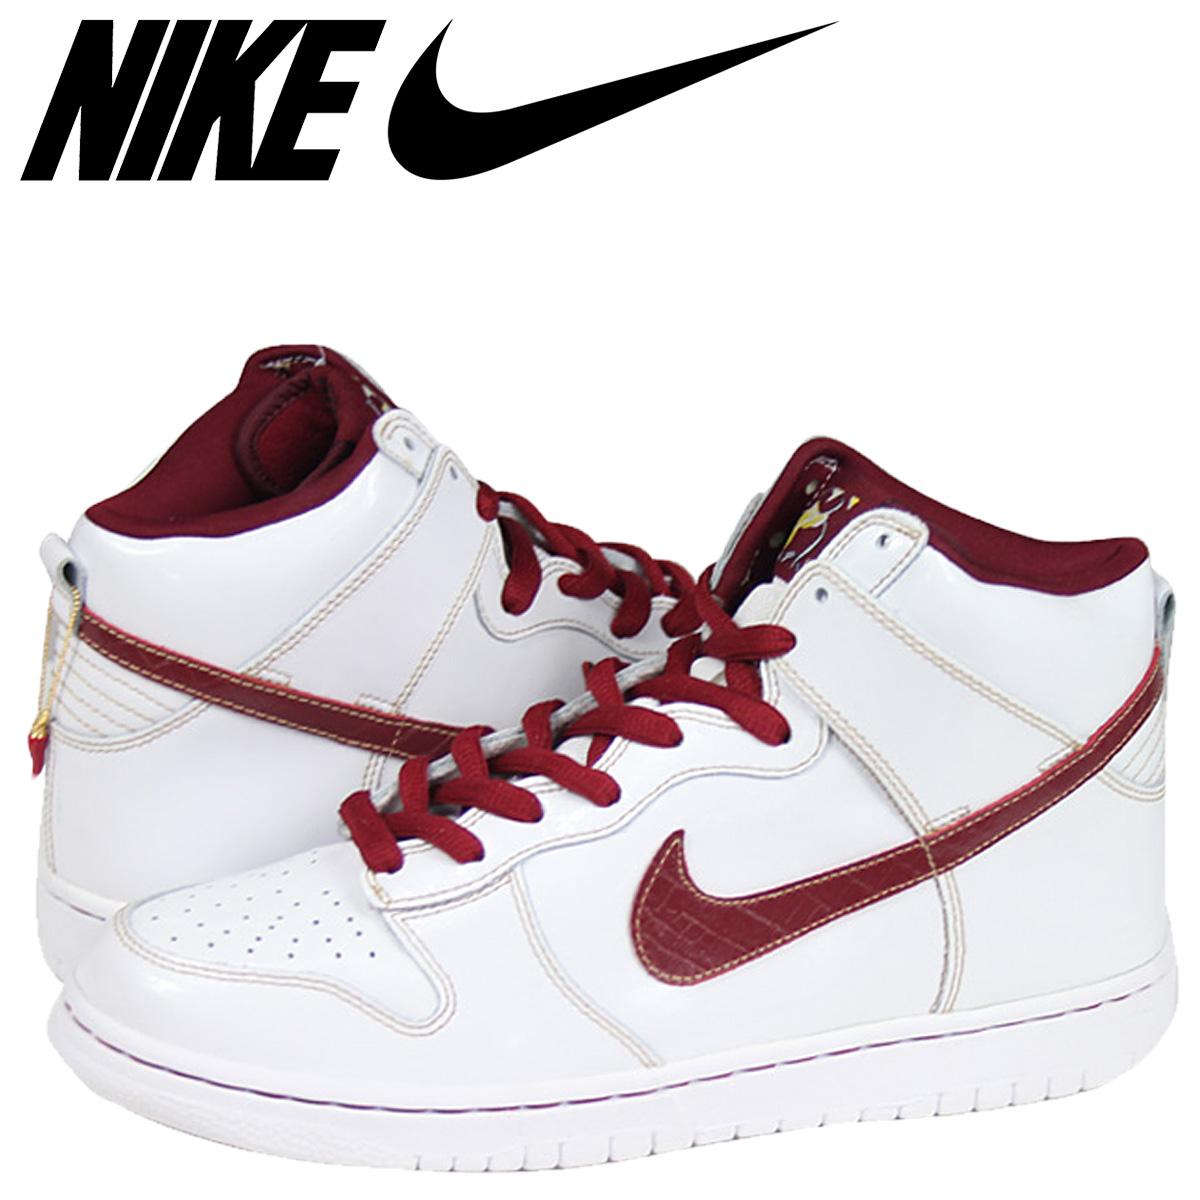 release date: 381c4 e3f58 Nike NIKE dunk sneakers DUNK HI PREMIUM SB GOODFELLAS MAFIA PACK high premium  SB mafia Pack ...